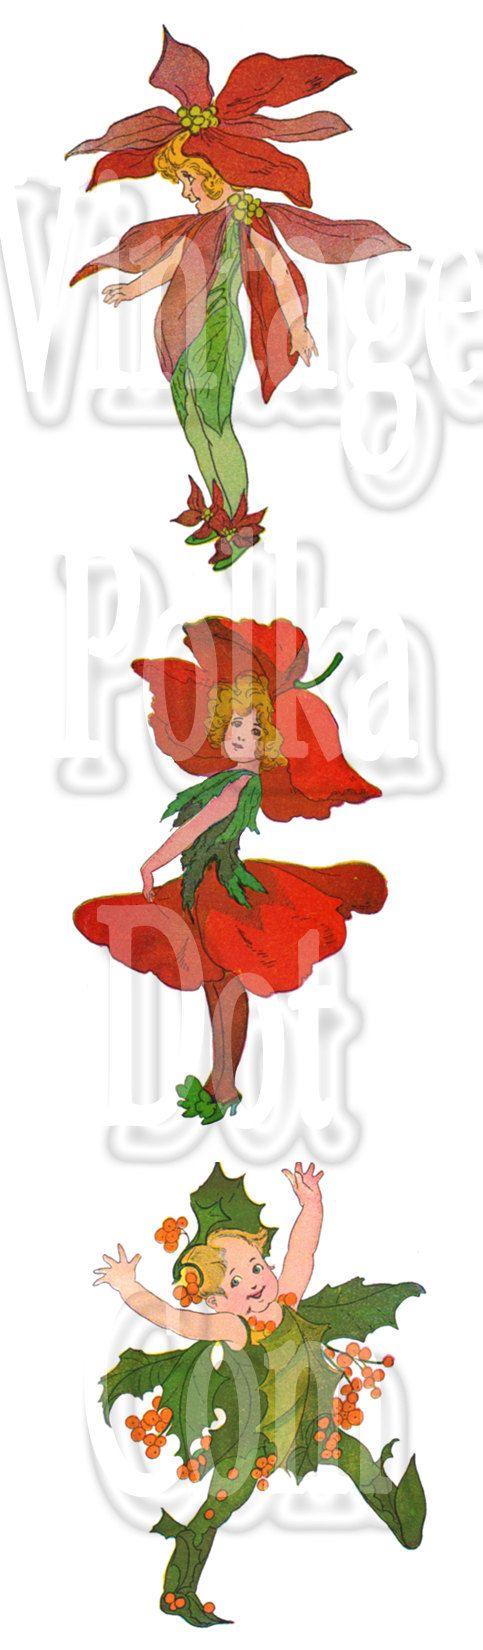 Poinsettia clipart printable Printable by 284 best Poinsettia